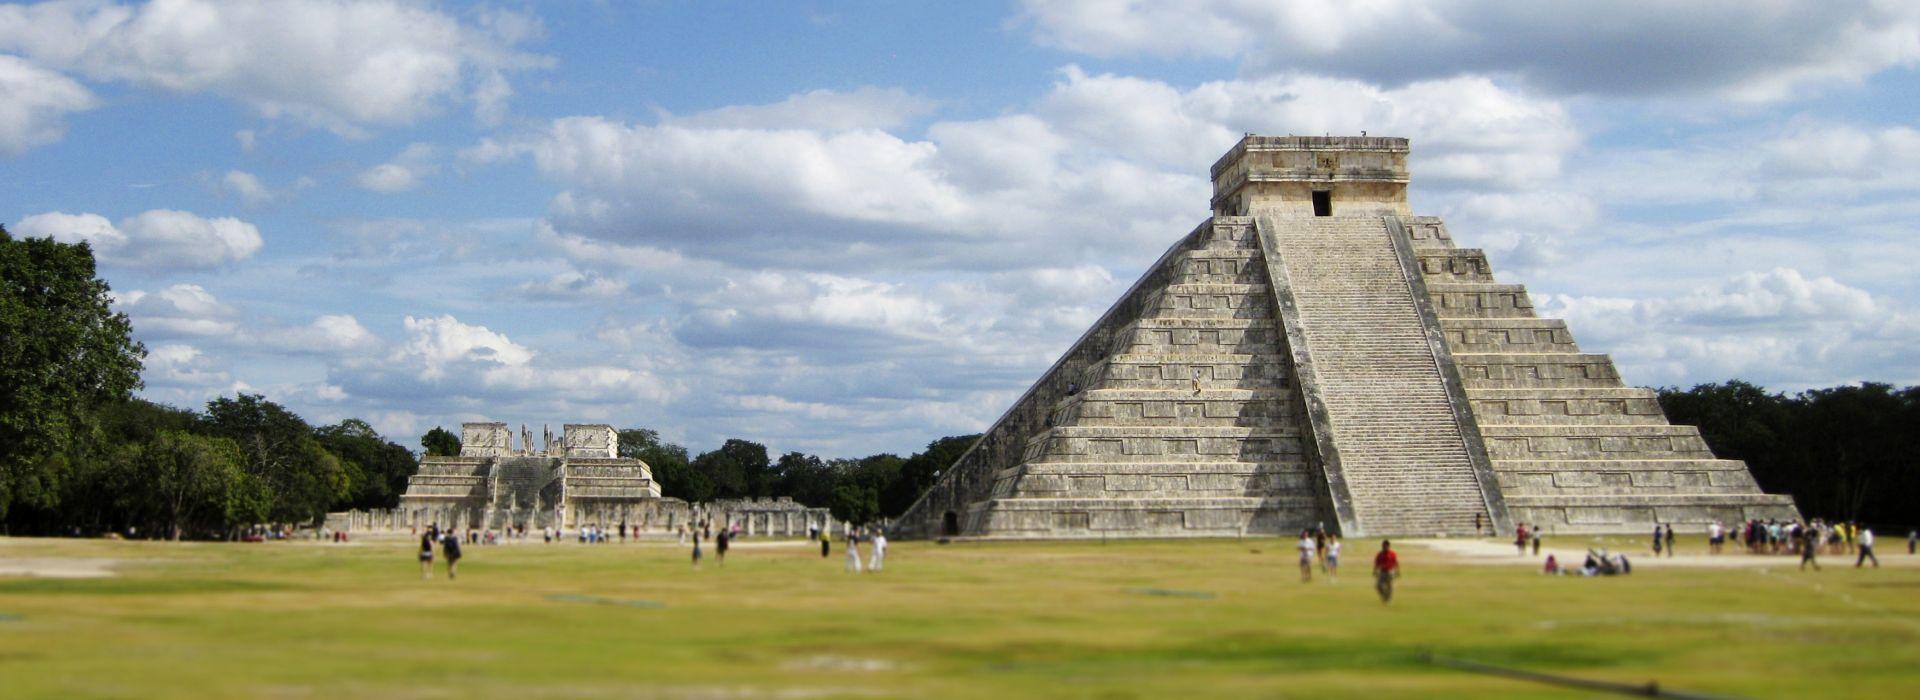 Explorer Tours in Mexico City